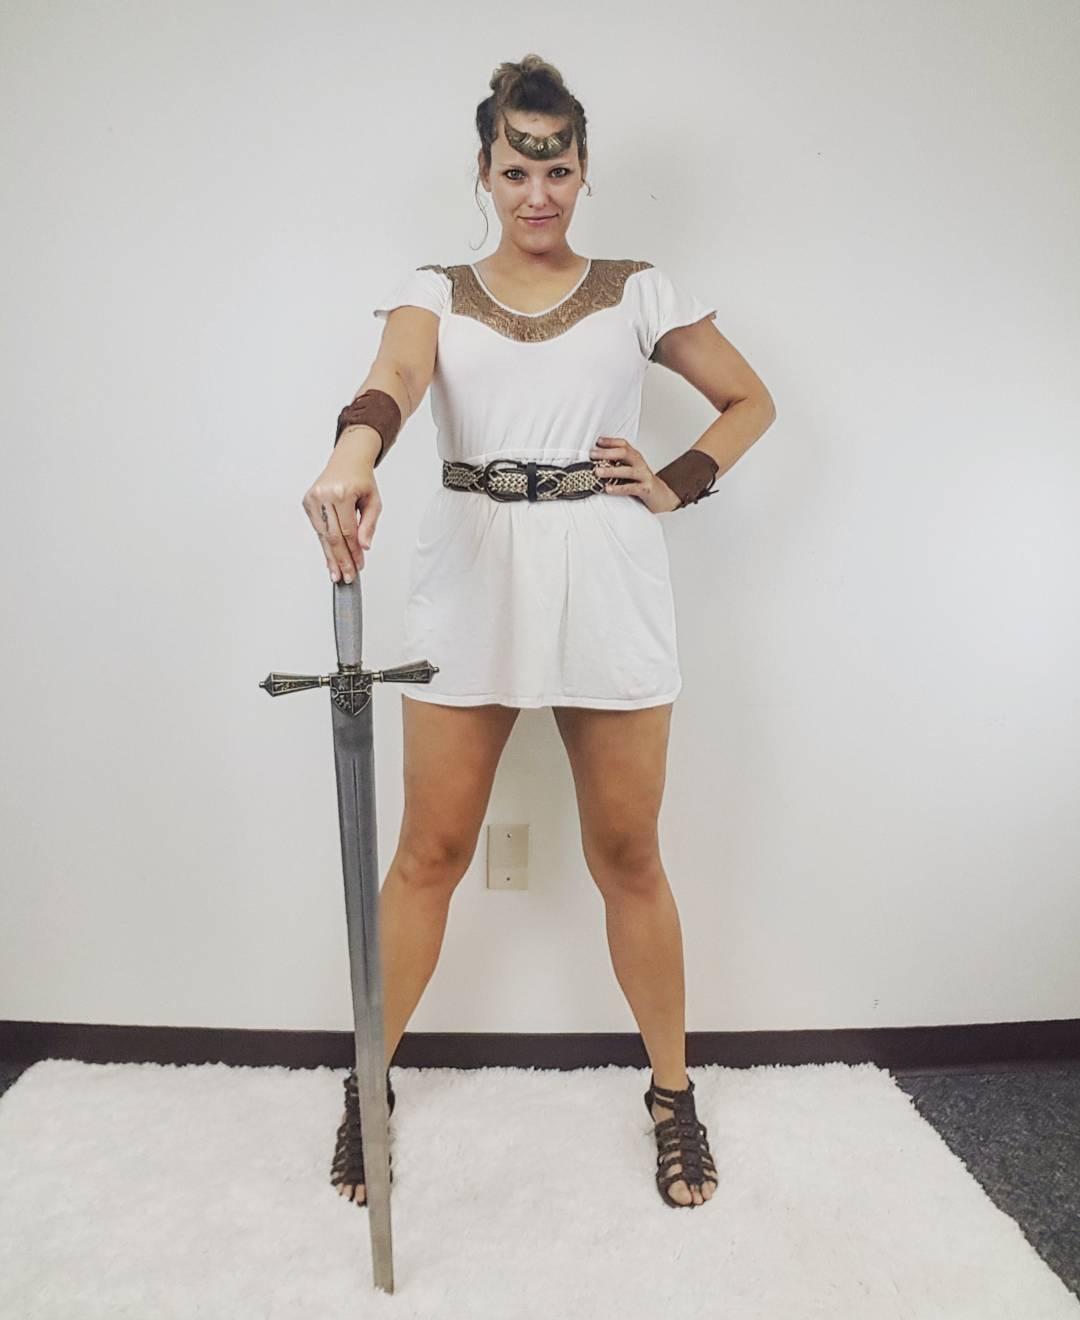 Thrift Store Cosplay Day 6 Amazon of Themyscira Wonder Woman fashion blog post DC Comics